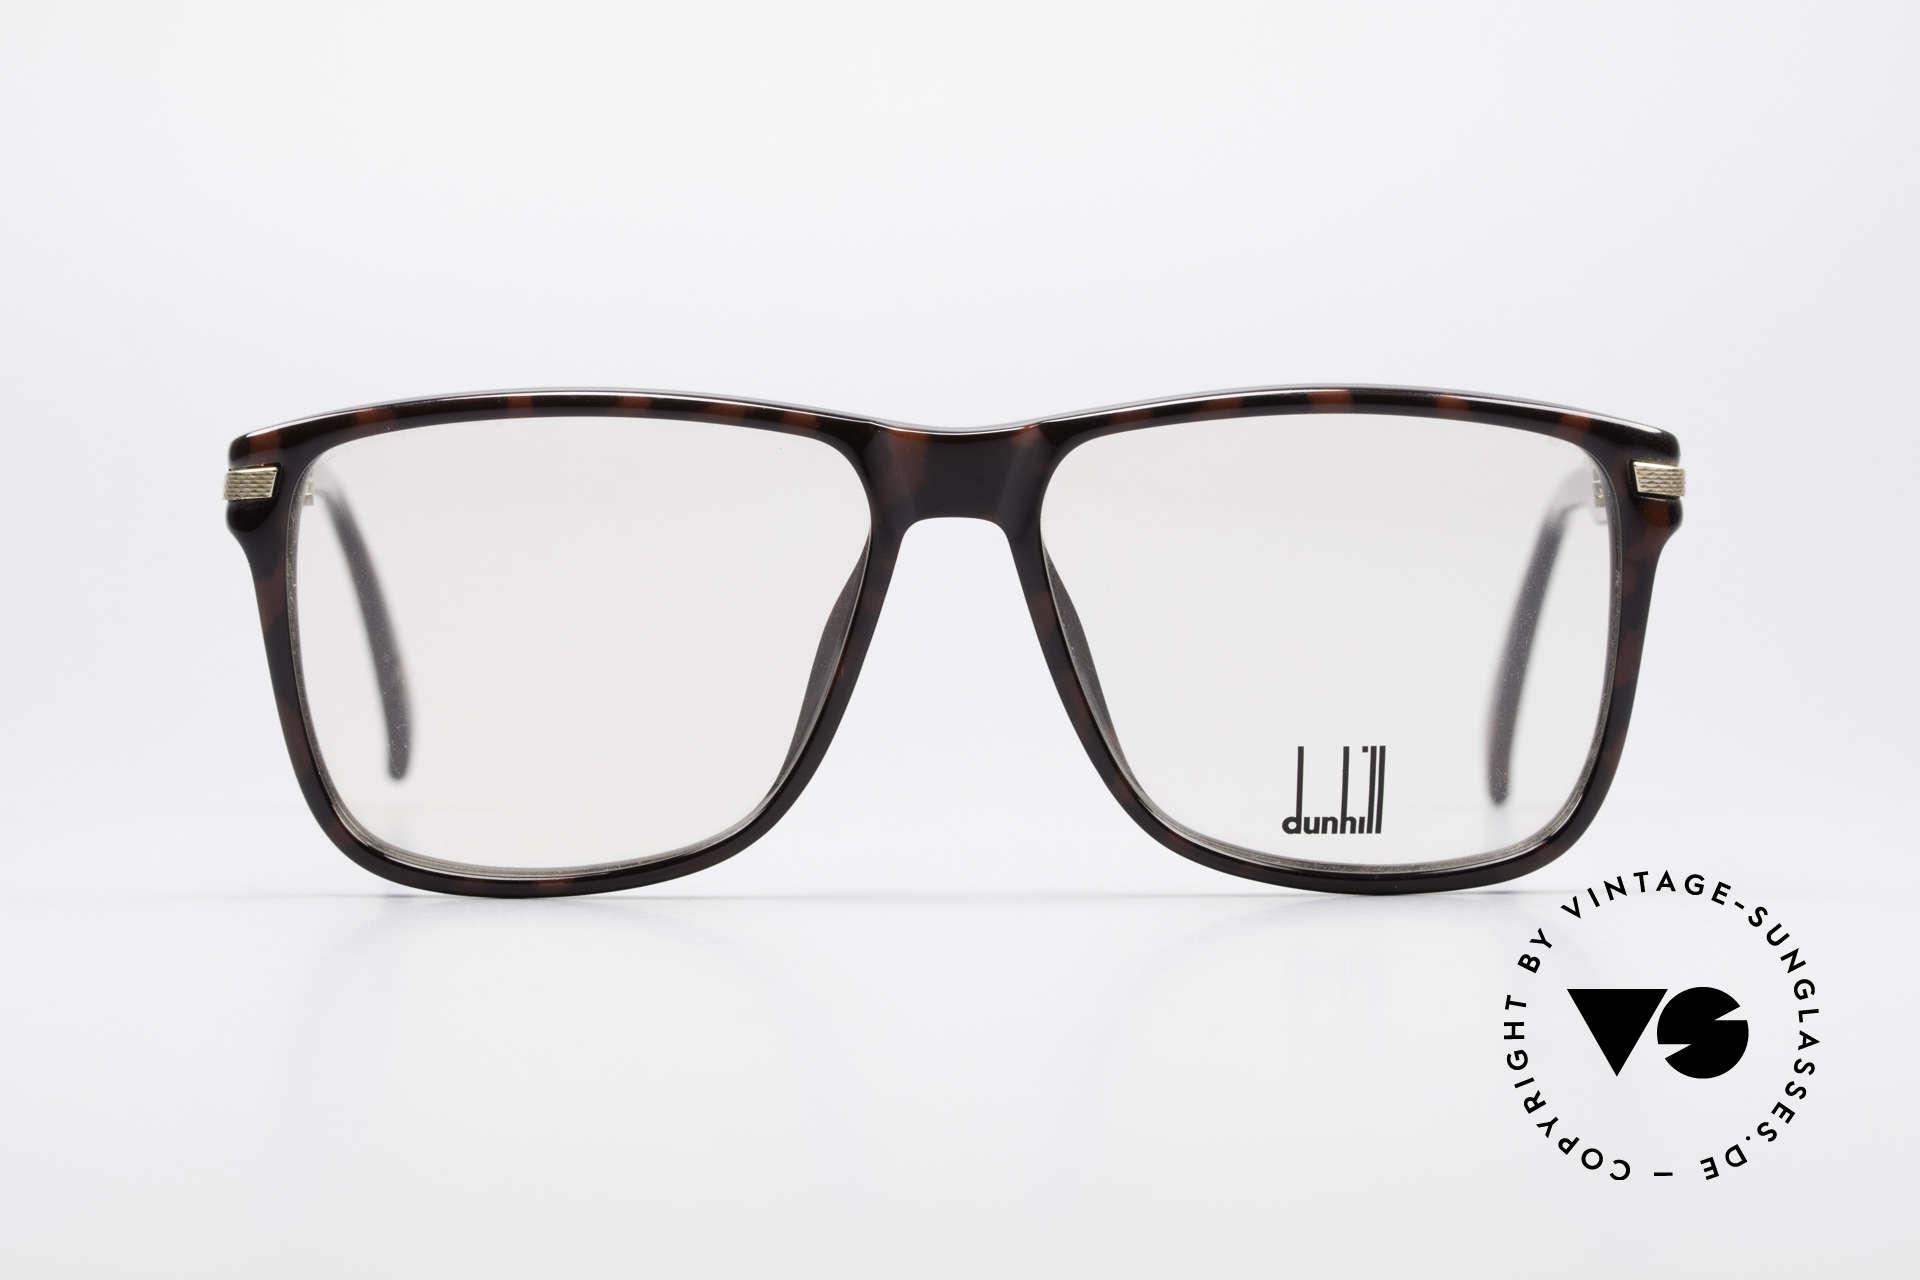 Dunhill 6055 Johnny Depp Nerd Style Frame, amazing design & frame coloring - sophisticated, Made for Men